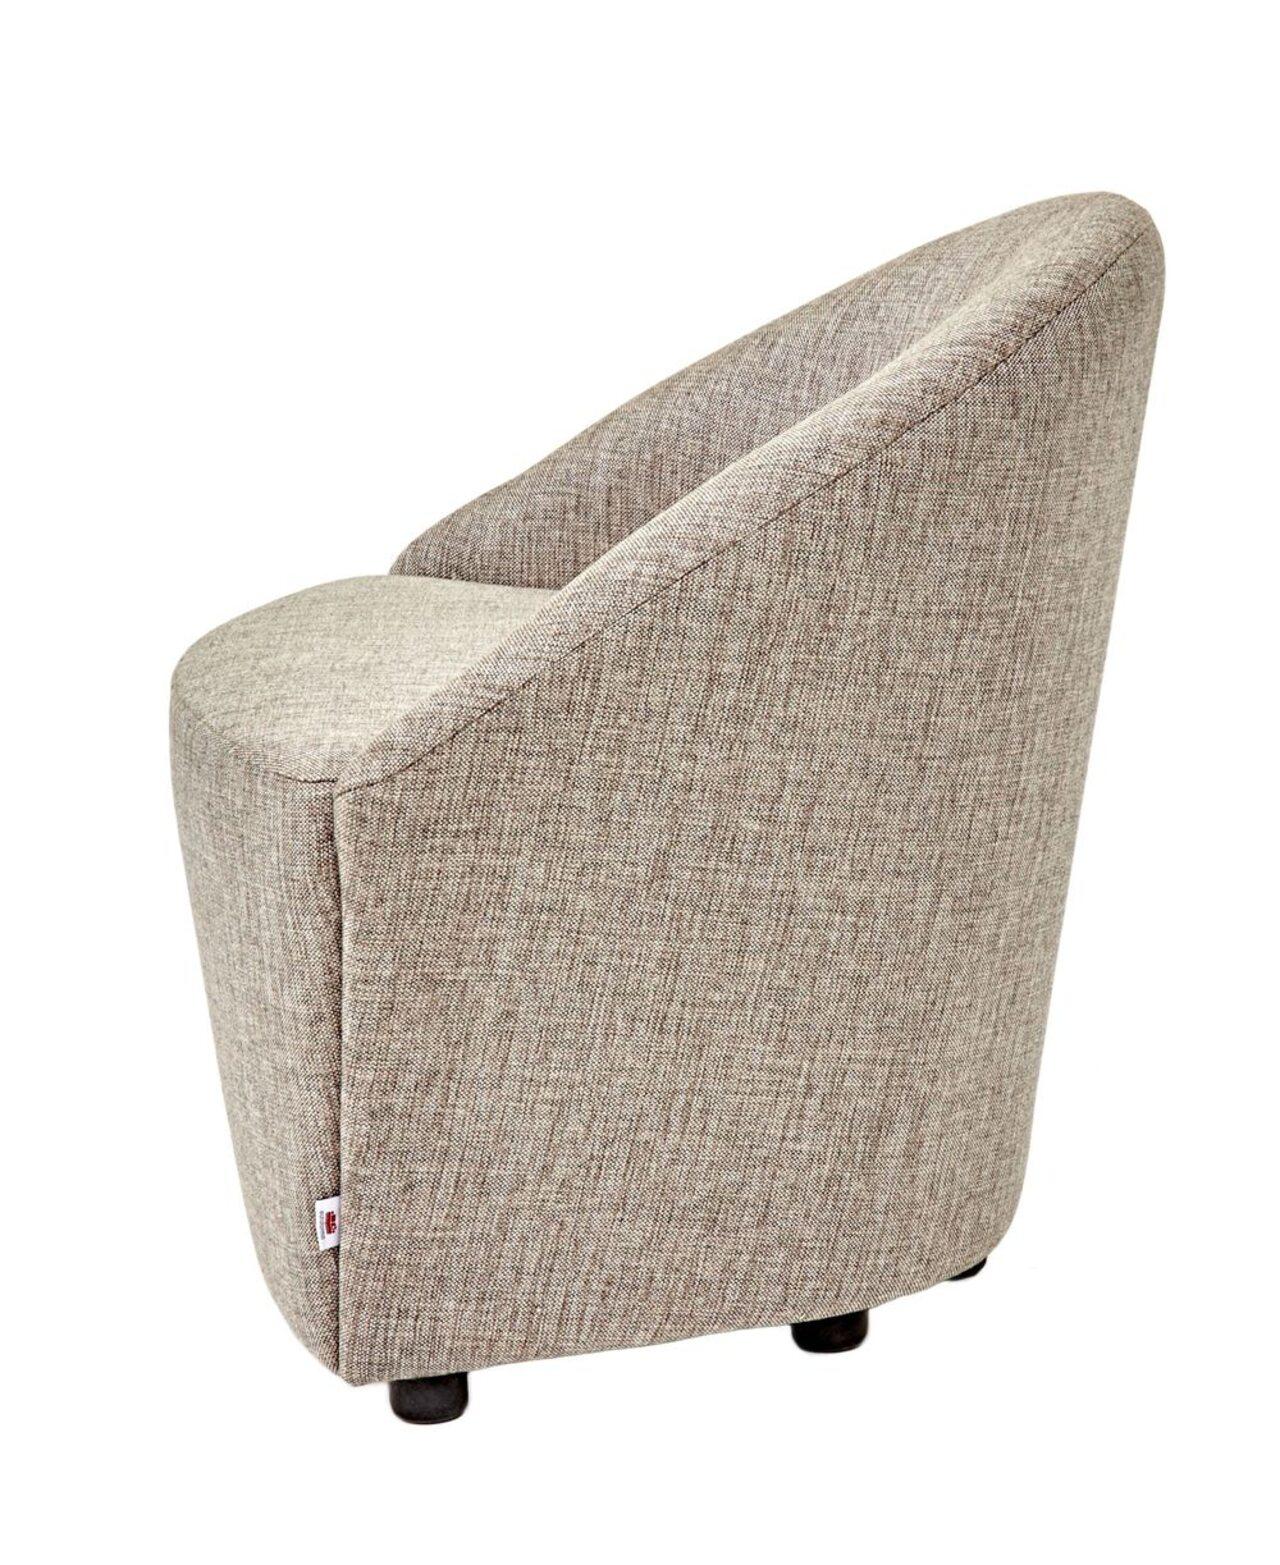 Кресло стационарное  3D 79x65x71 - фото 5